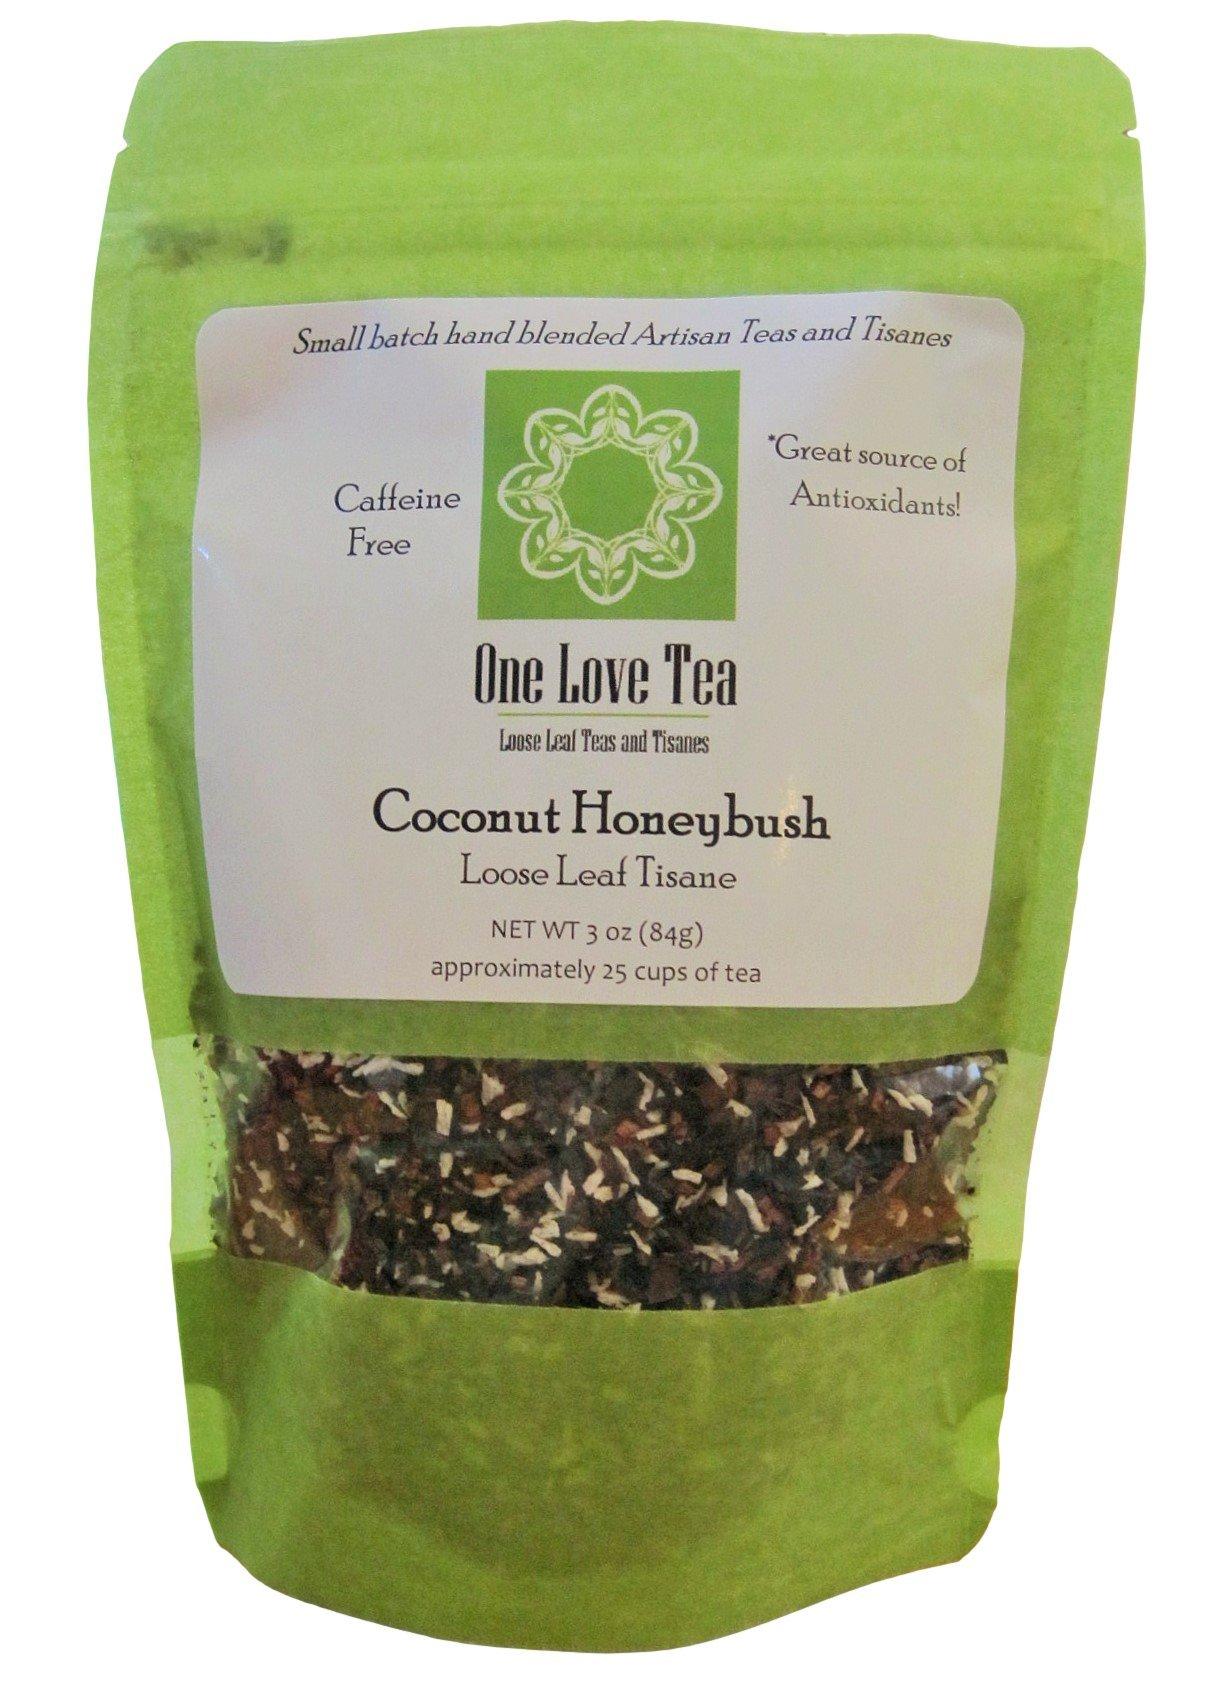 One Love Tea - Coconut Honeybush - 3 Oz Loose Leaf Herbal Tisane